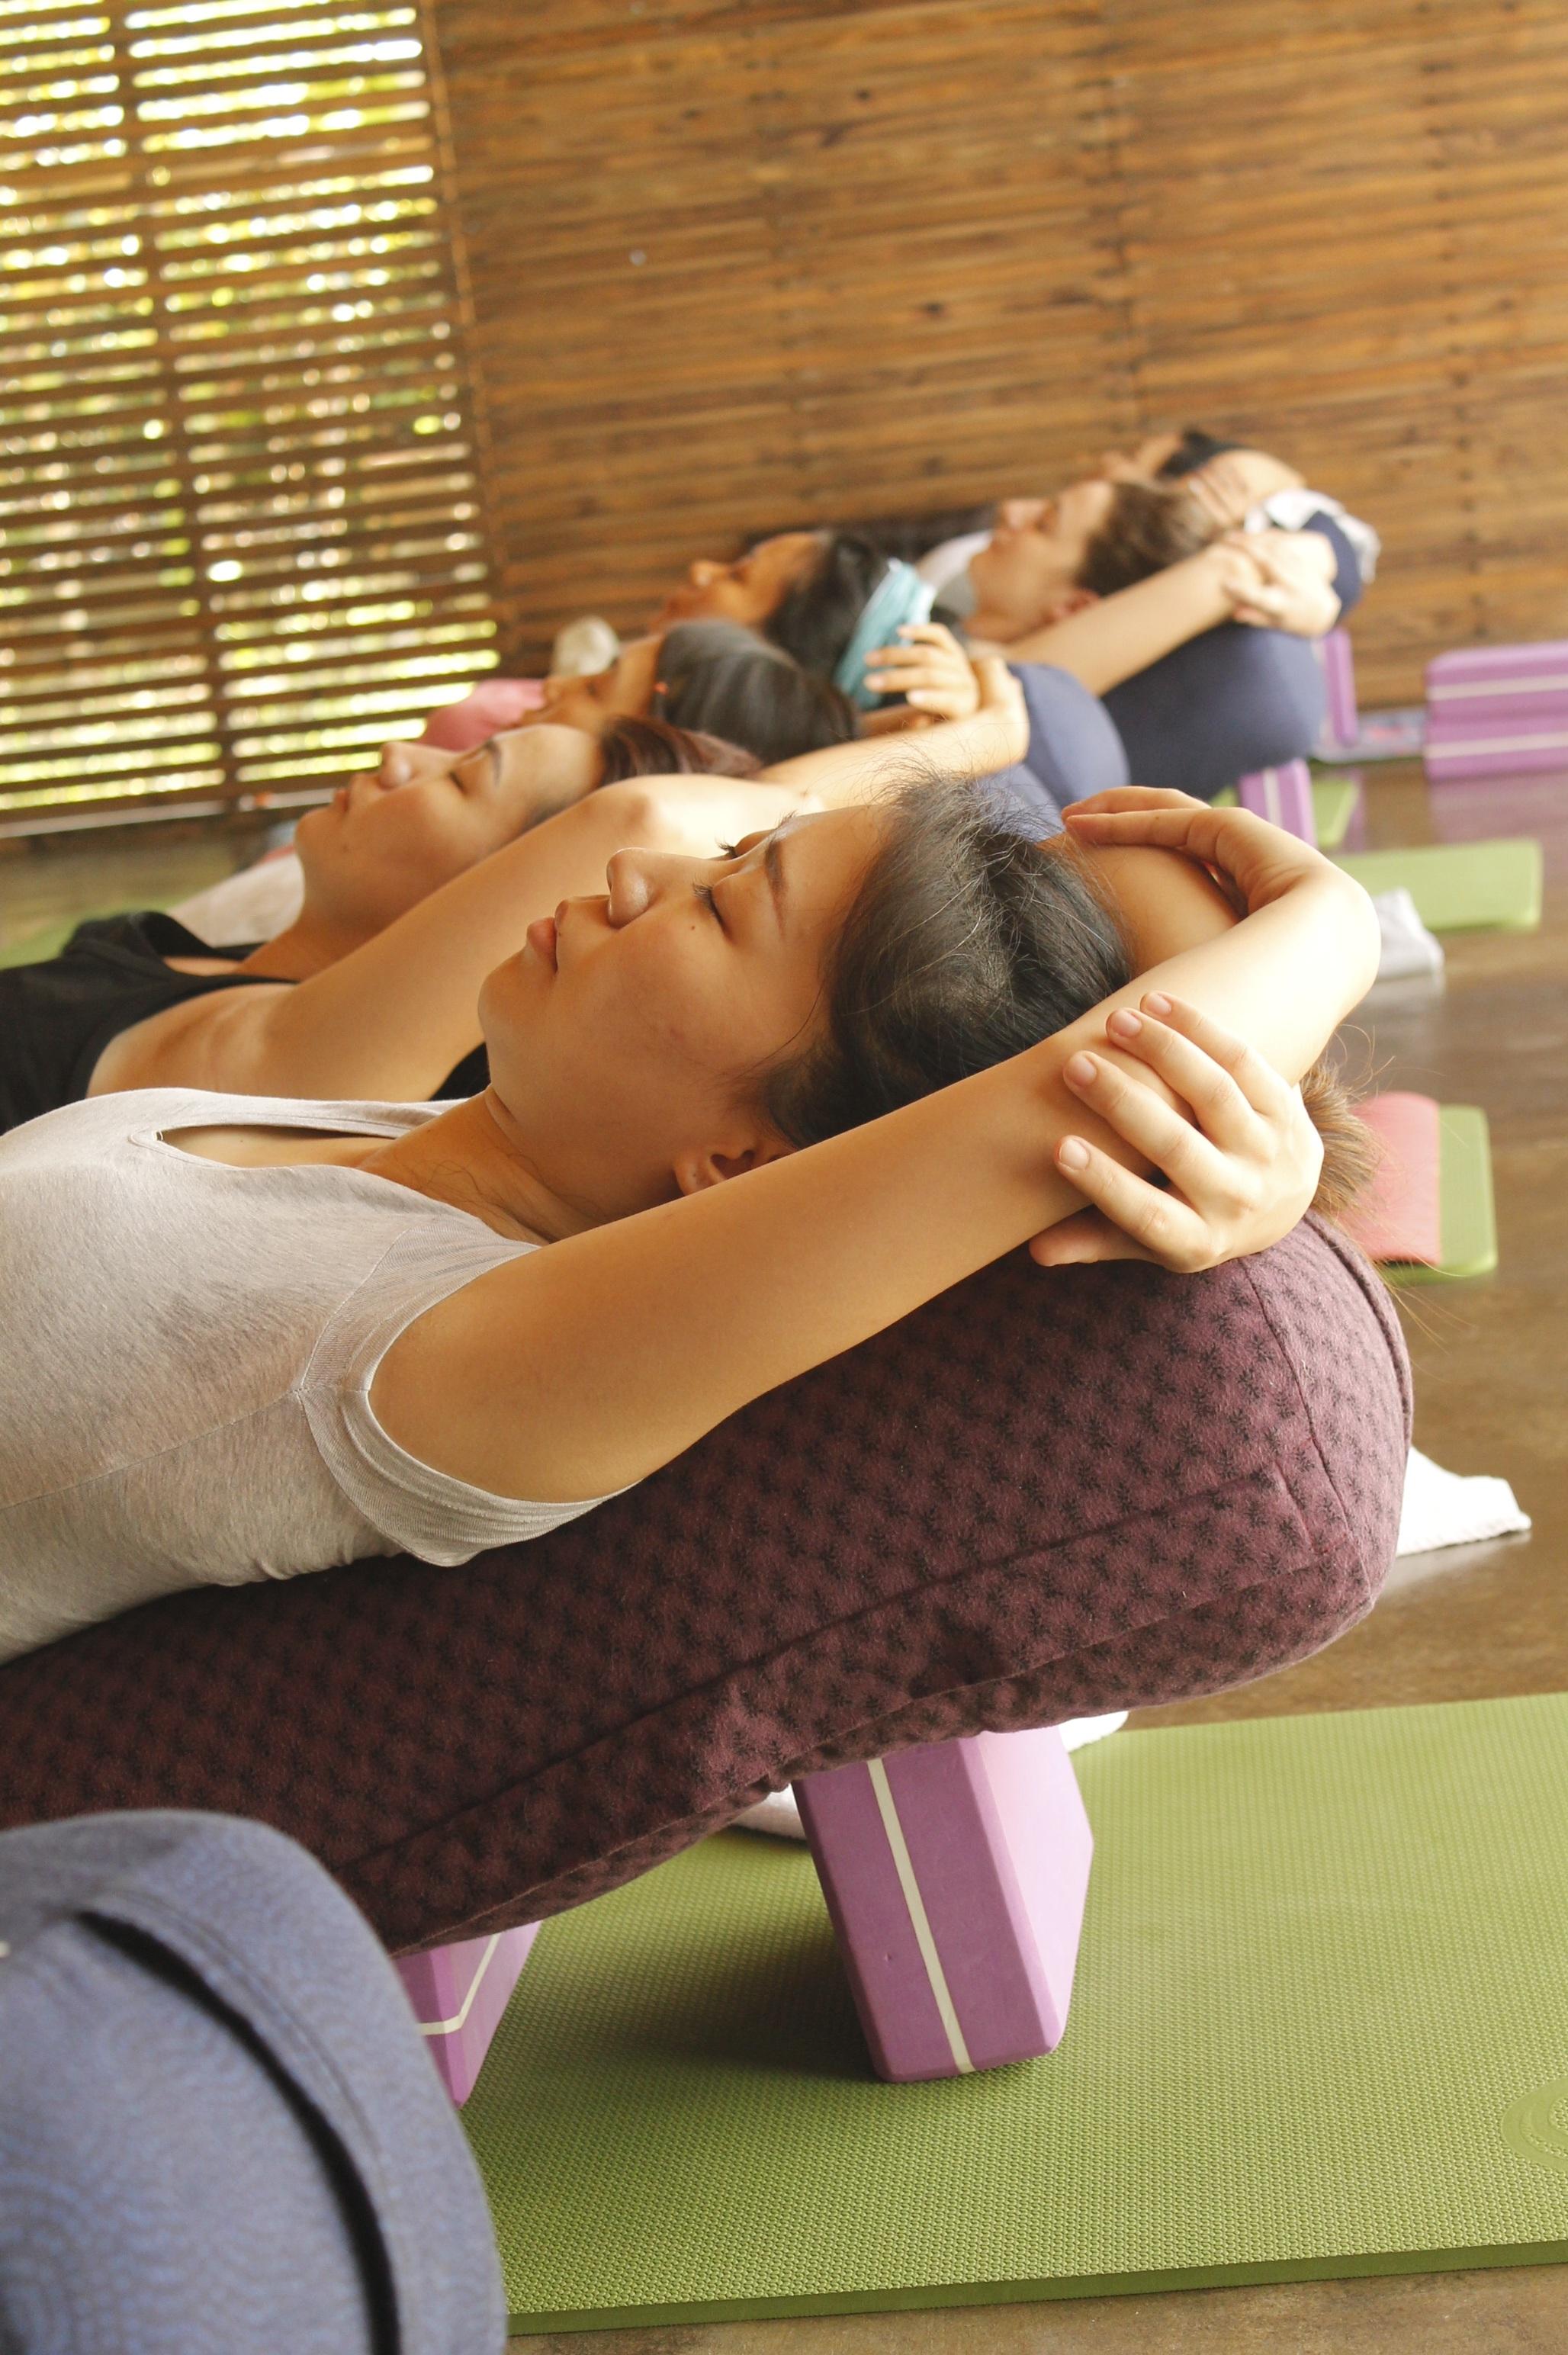 restorative-yoga-reiki-class-geelong-west-ocean-grove-victoria-australia